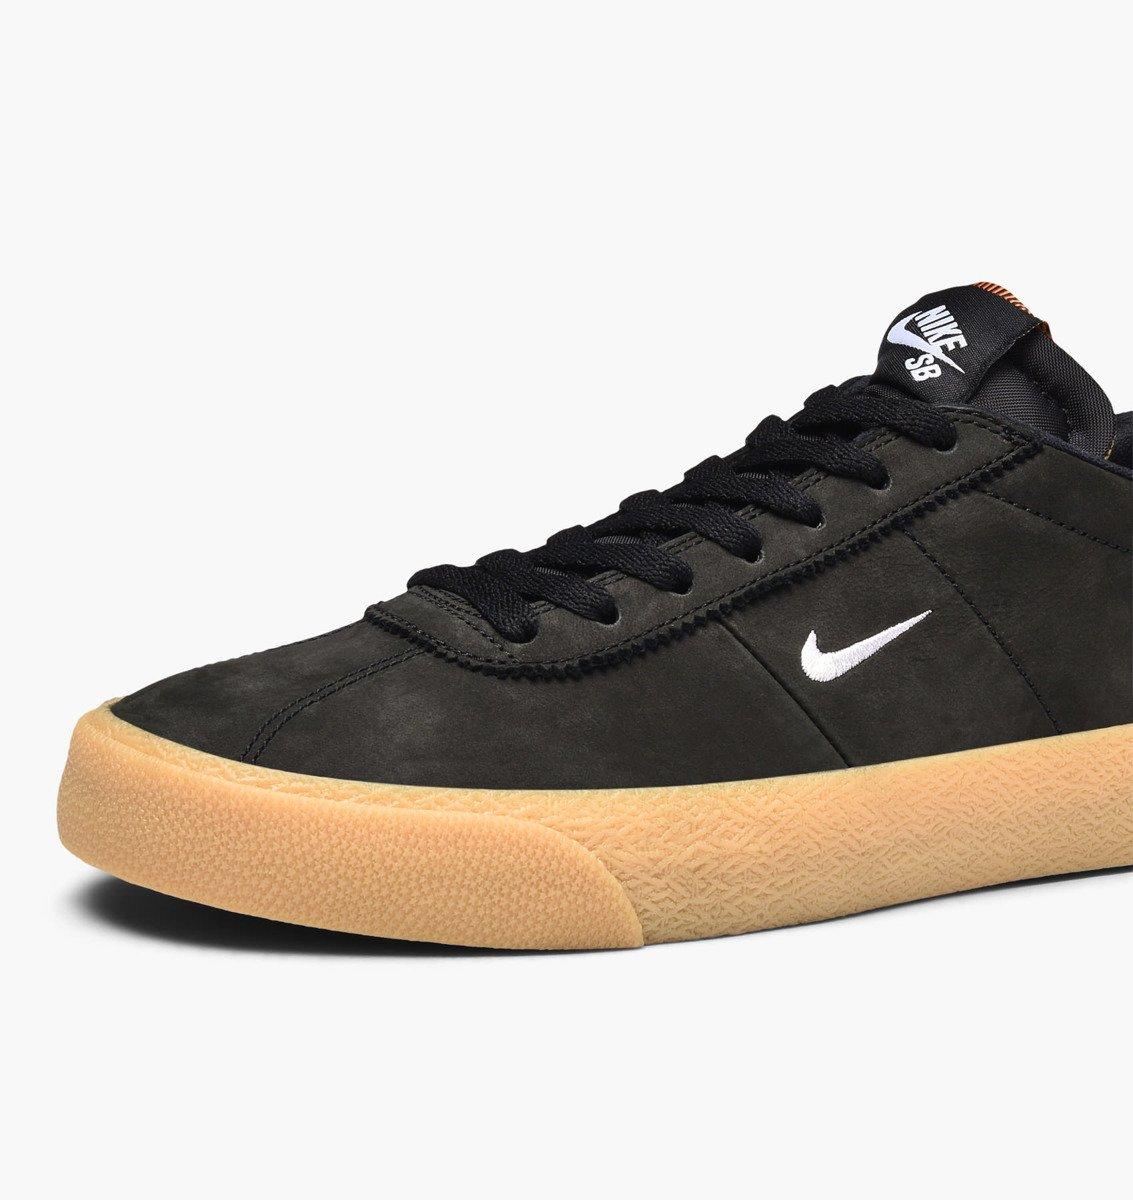 Donación Nutrición cuota de matrícula  Nike SB Zoom Bruin ISO Black/white-safety Orange | Shoes \ Nike SB Brands \ Nike  SB ALL | Skateshop Miniramp.pl